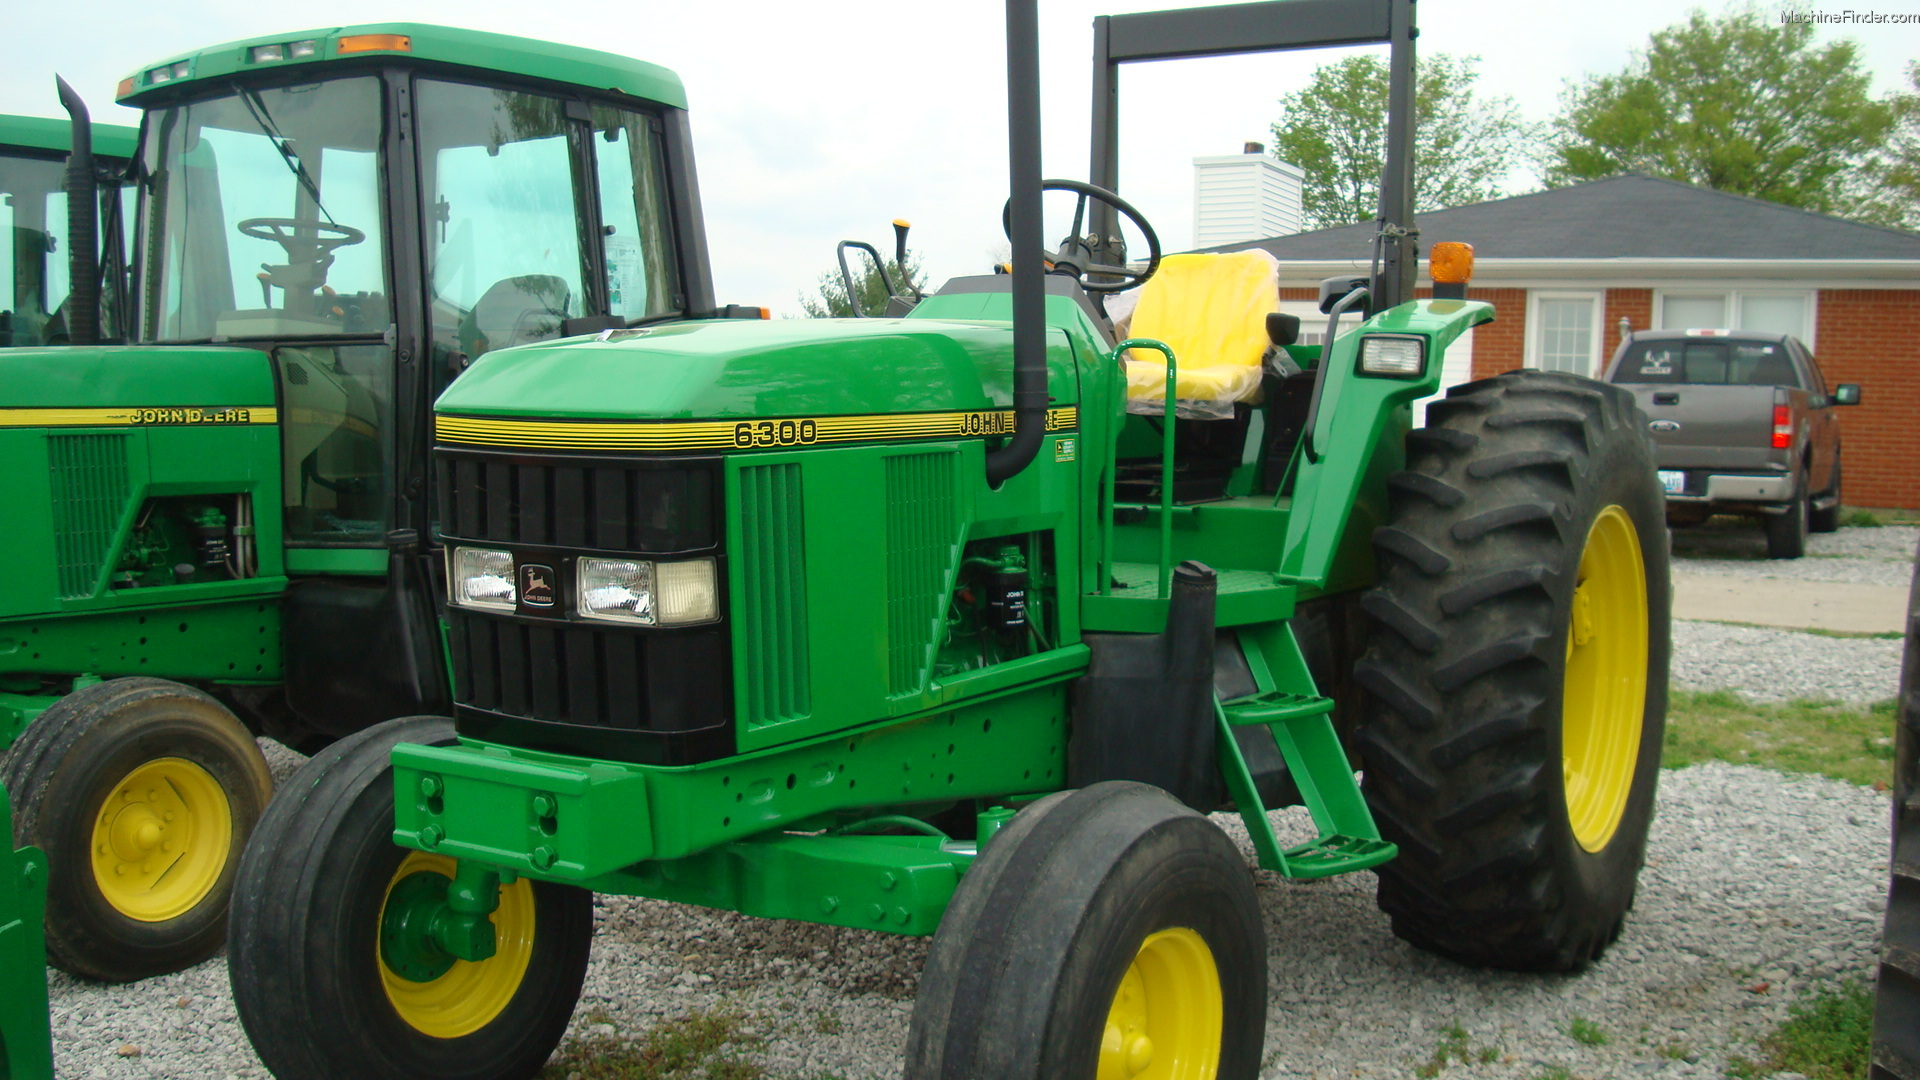 John Deere 6310 Farm Tractor Tractors 6320 Wiring Diagram 1997 6300 Utility 40 100hp